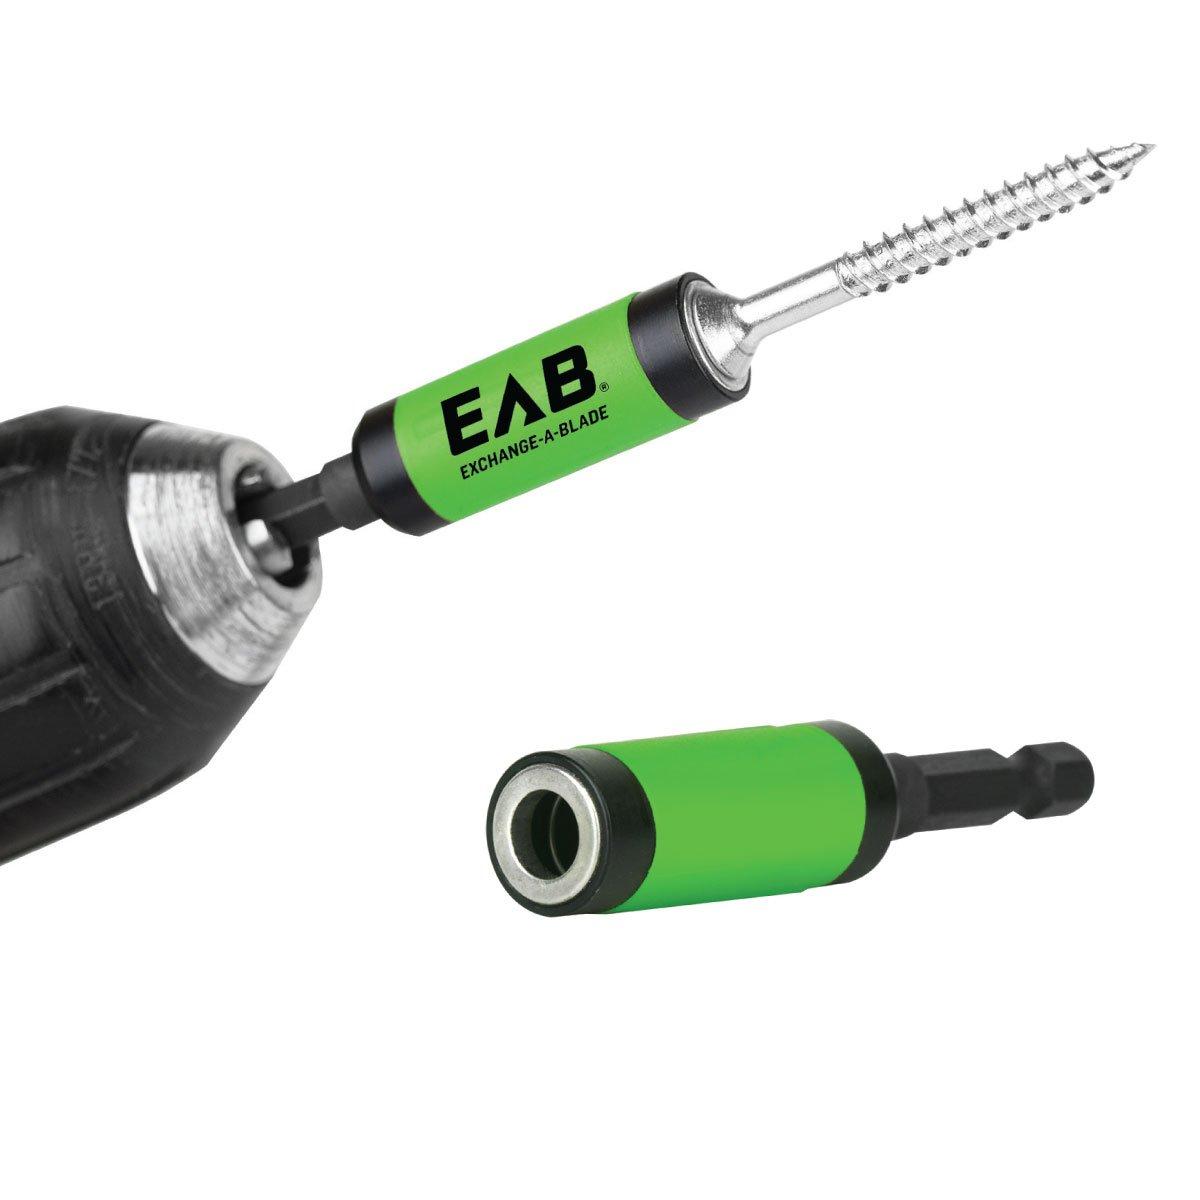 EAB Tool 93711 Industrial Magnetic Screwdriver Bit,